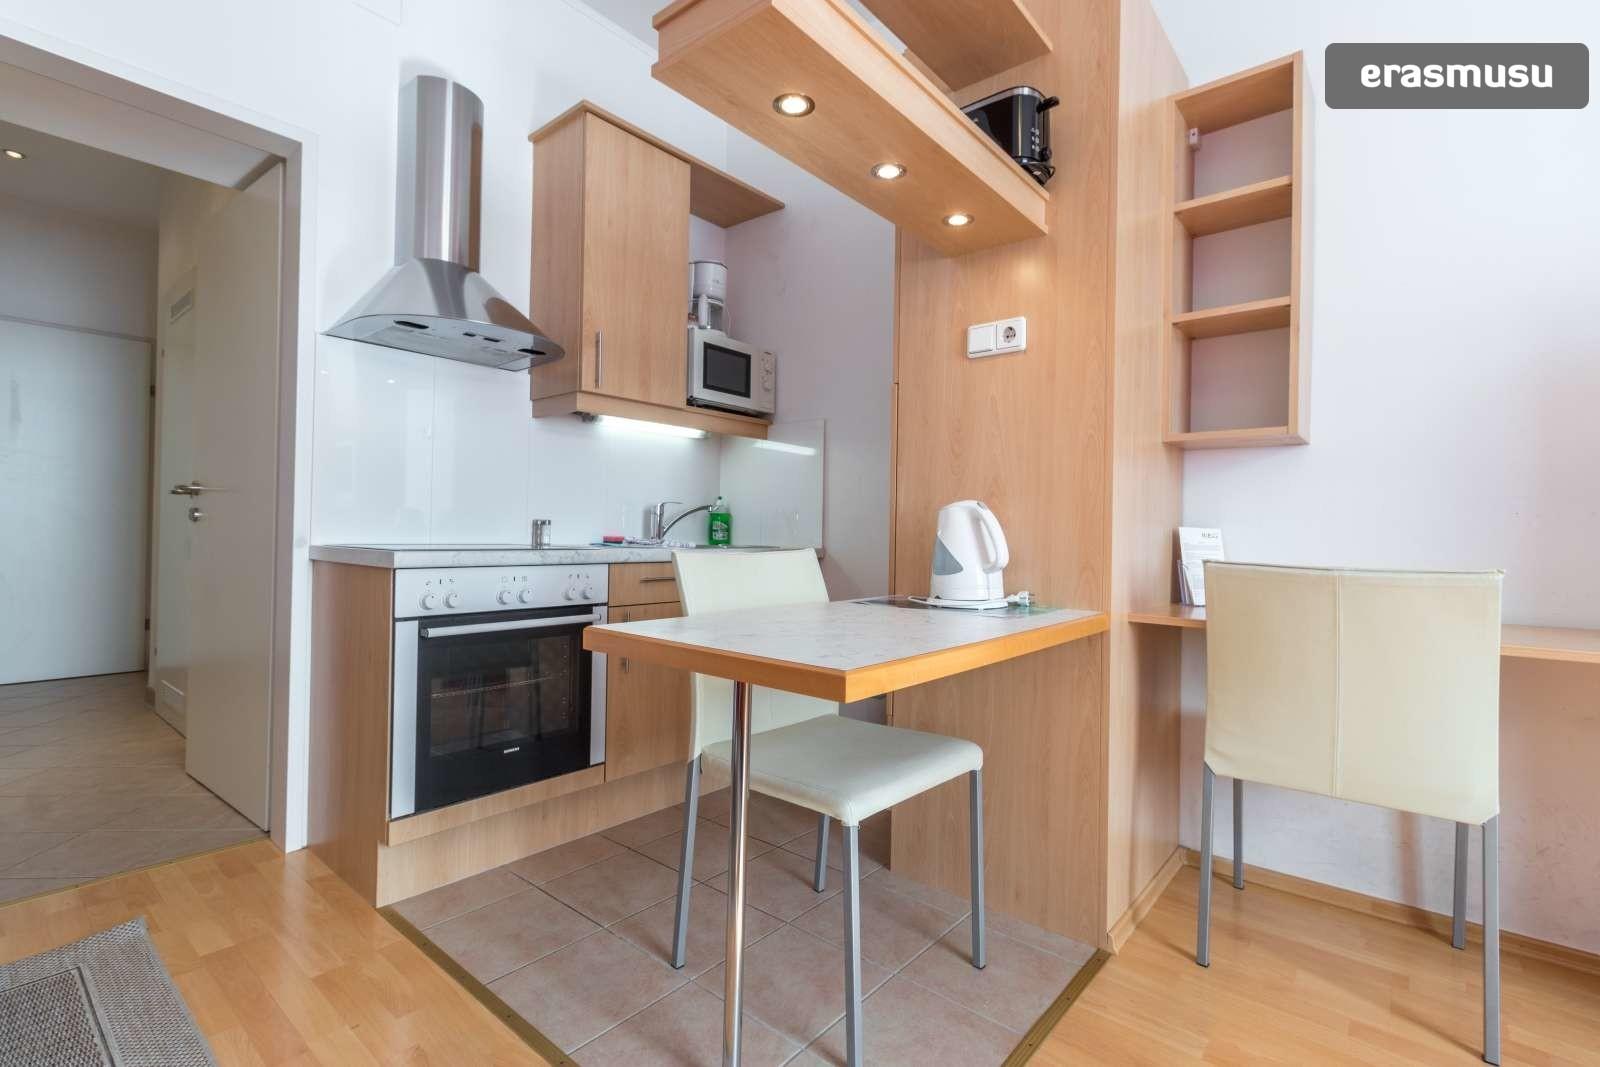 sunny-studio-apartment-rent-near-bohemian-prater-favoriten-5206a